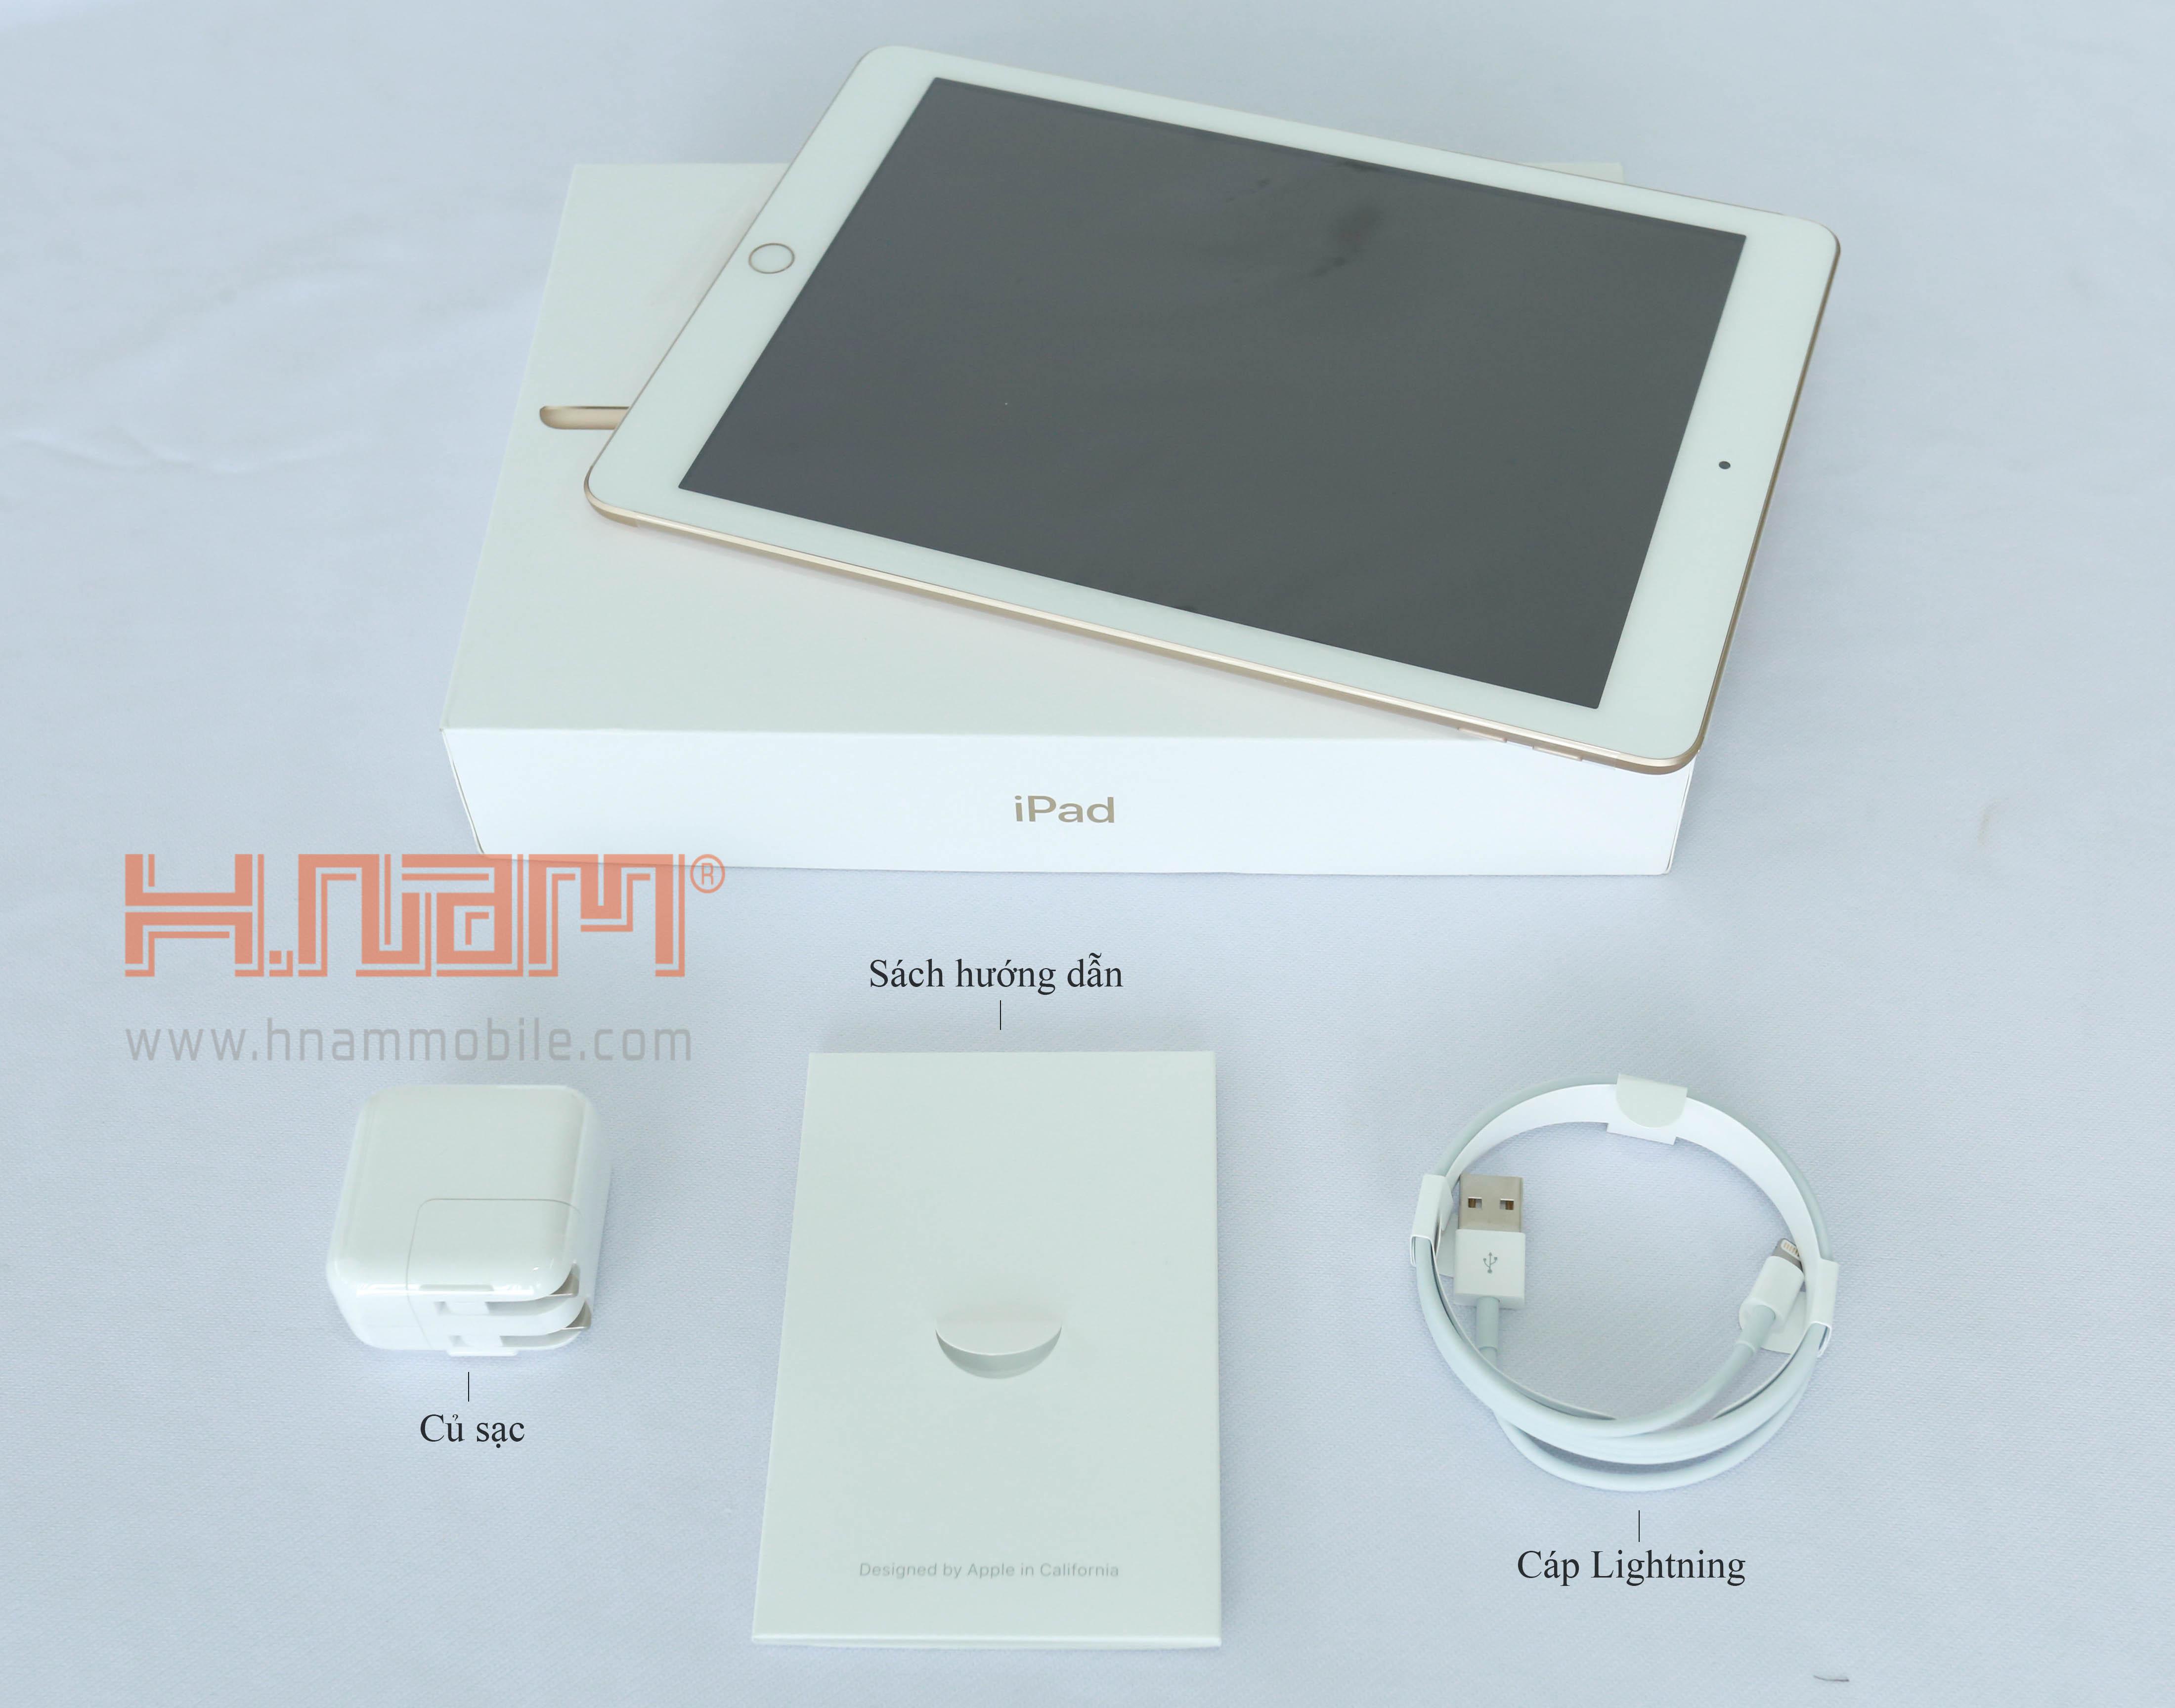 Apple iPad Gen 6 (2018) Cellular 32Gb hình sản phẩm 0